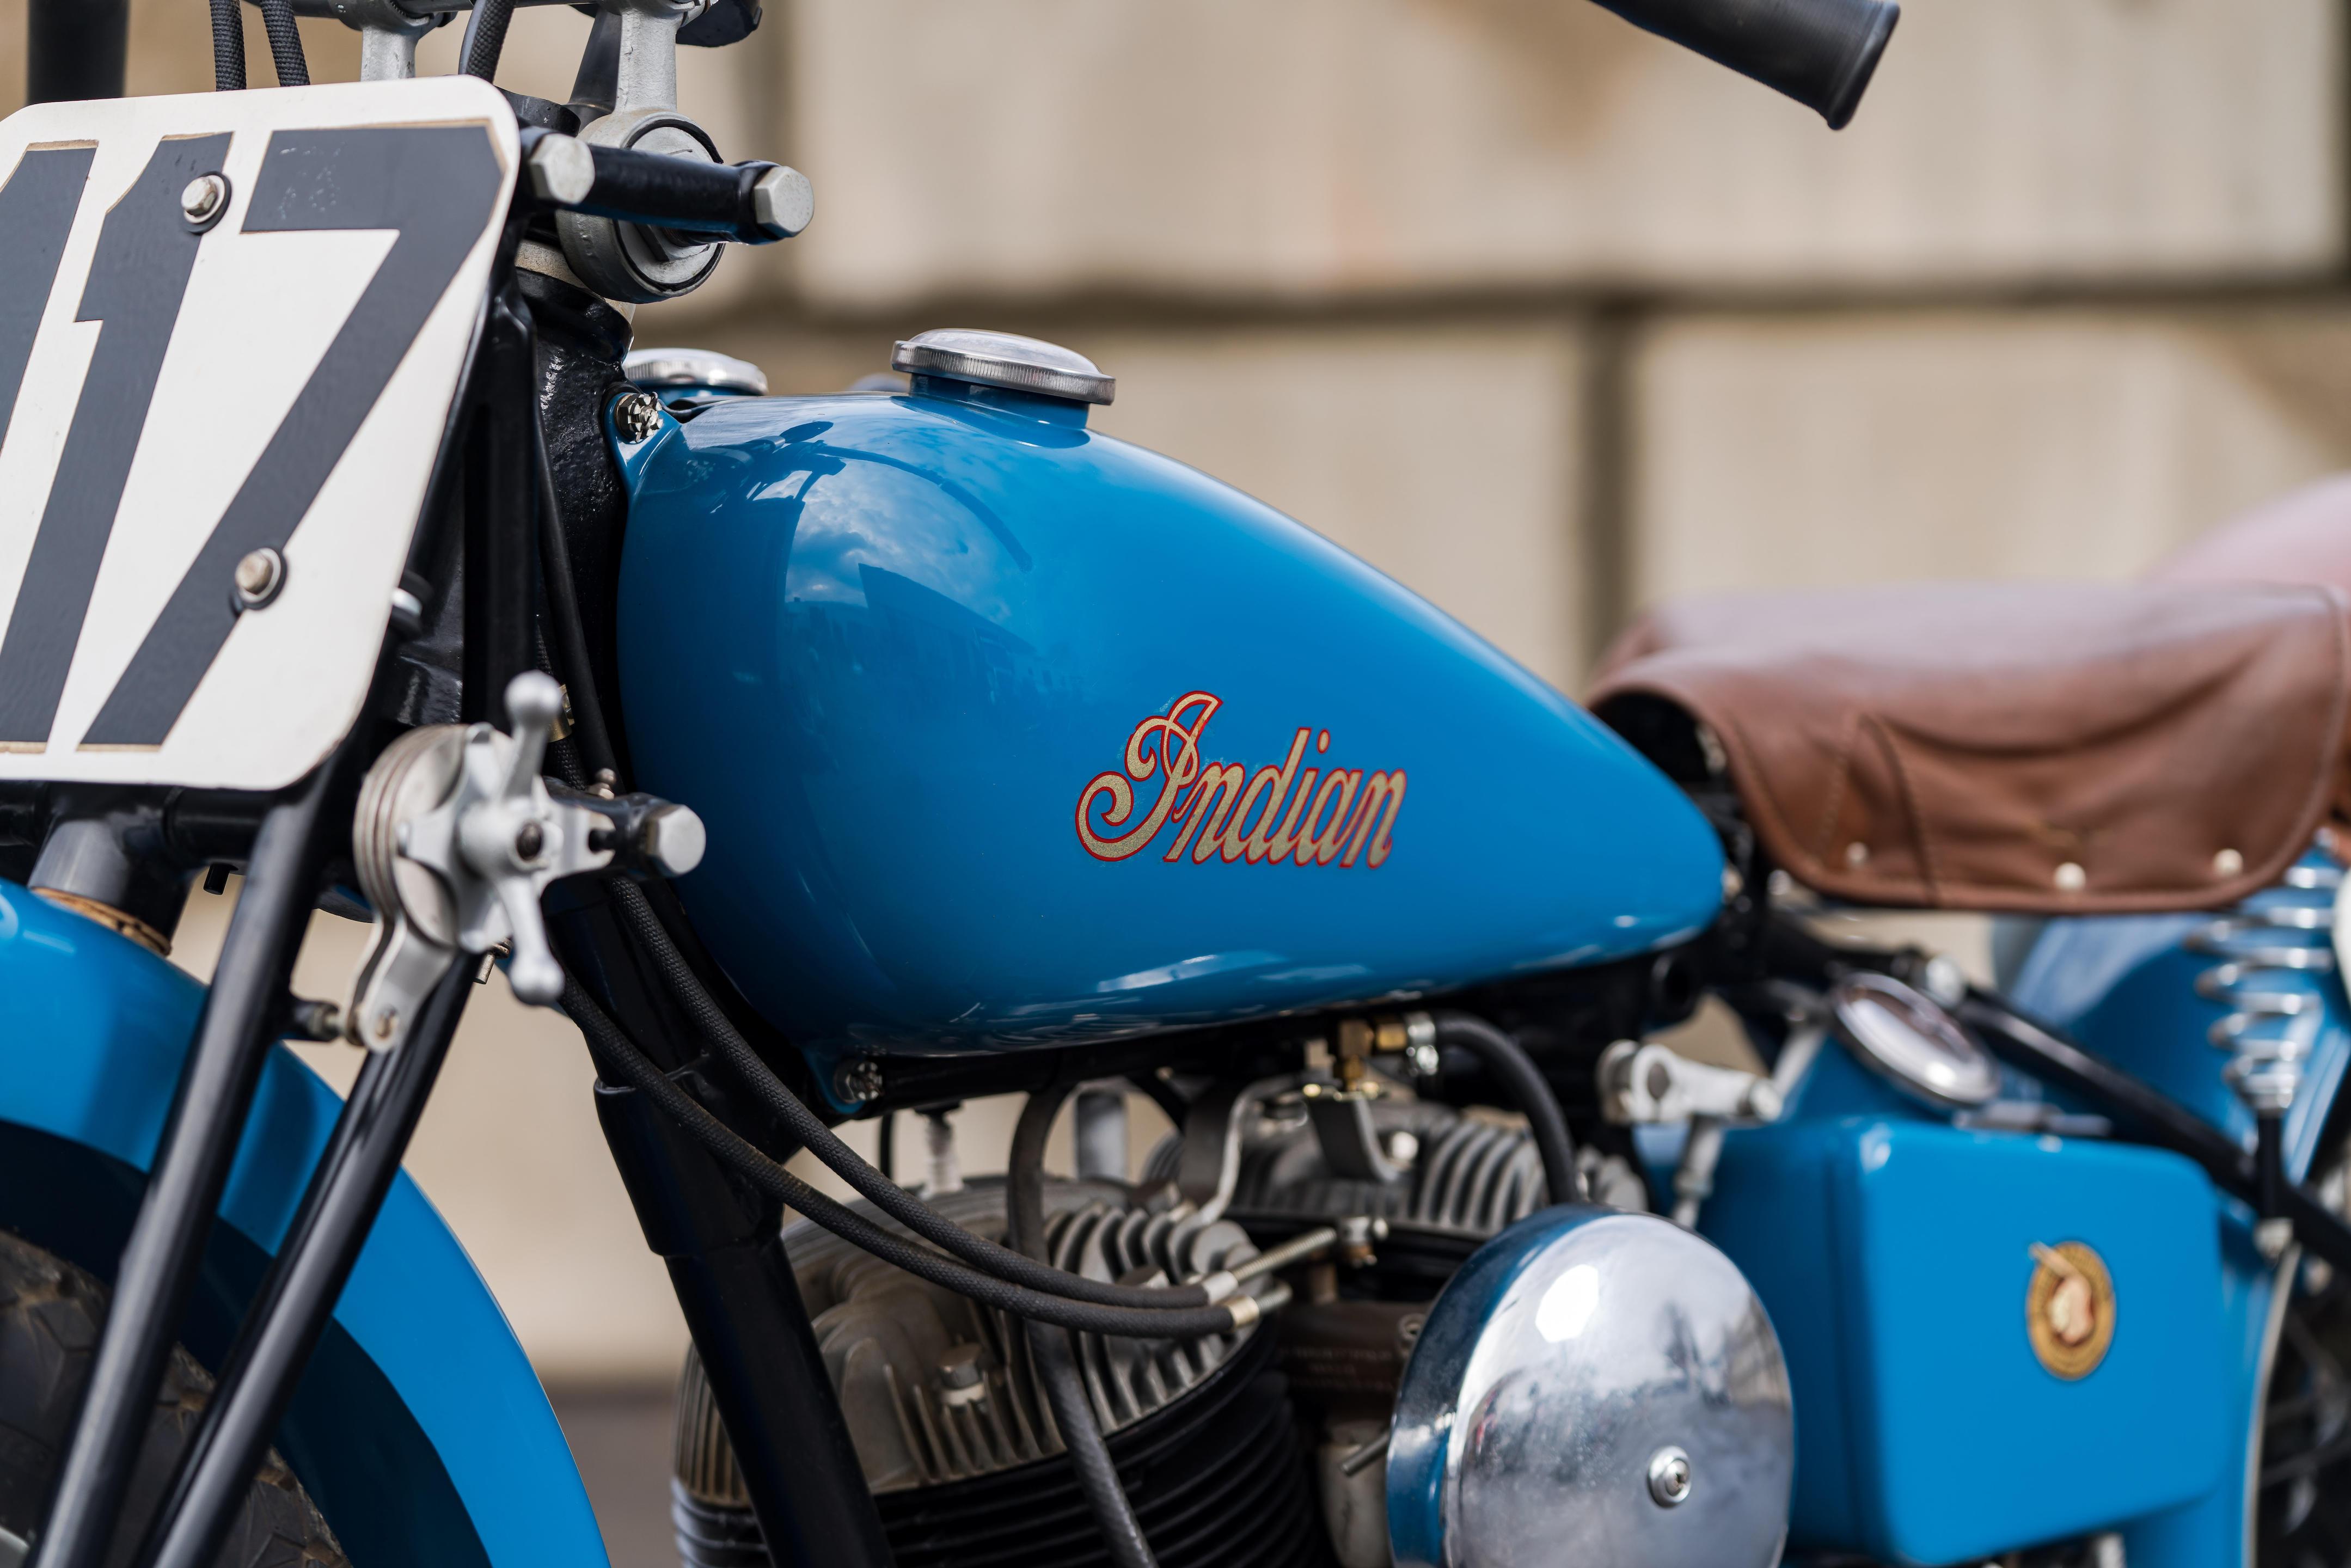 1948 DAYTONA BEACH 200 RACE MOTORCYCLE RACING START PHOTO HARLEY DAVIDSON-INDIAN